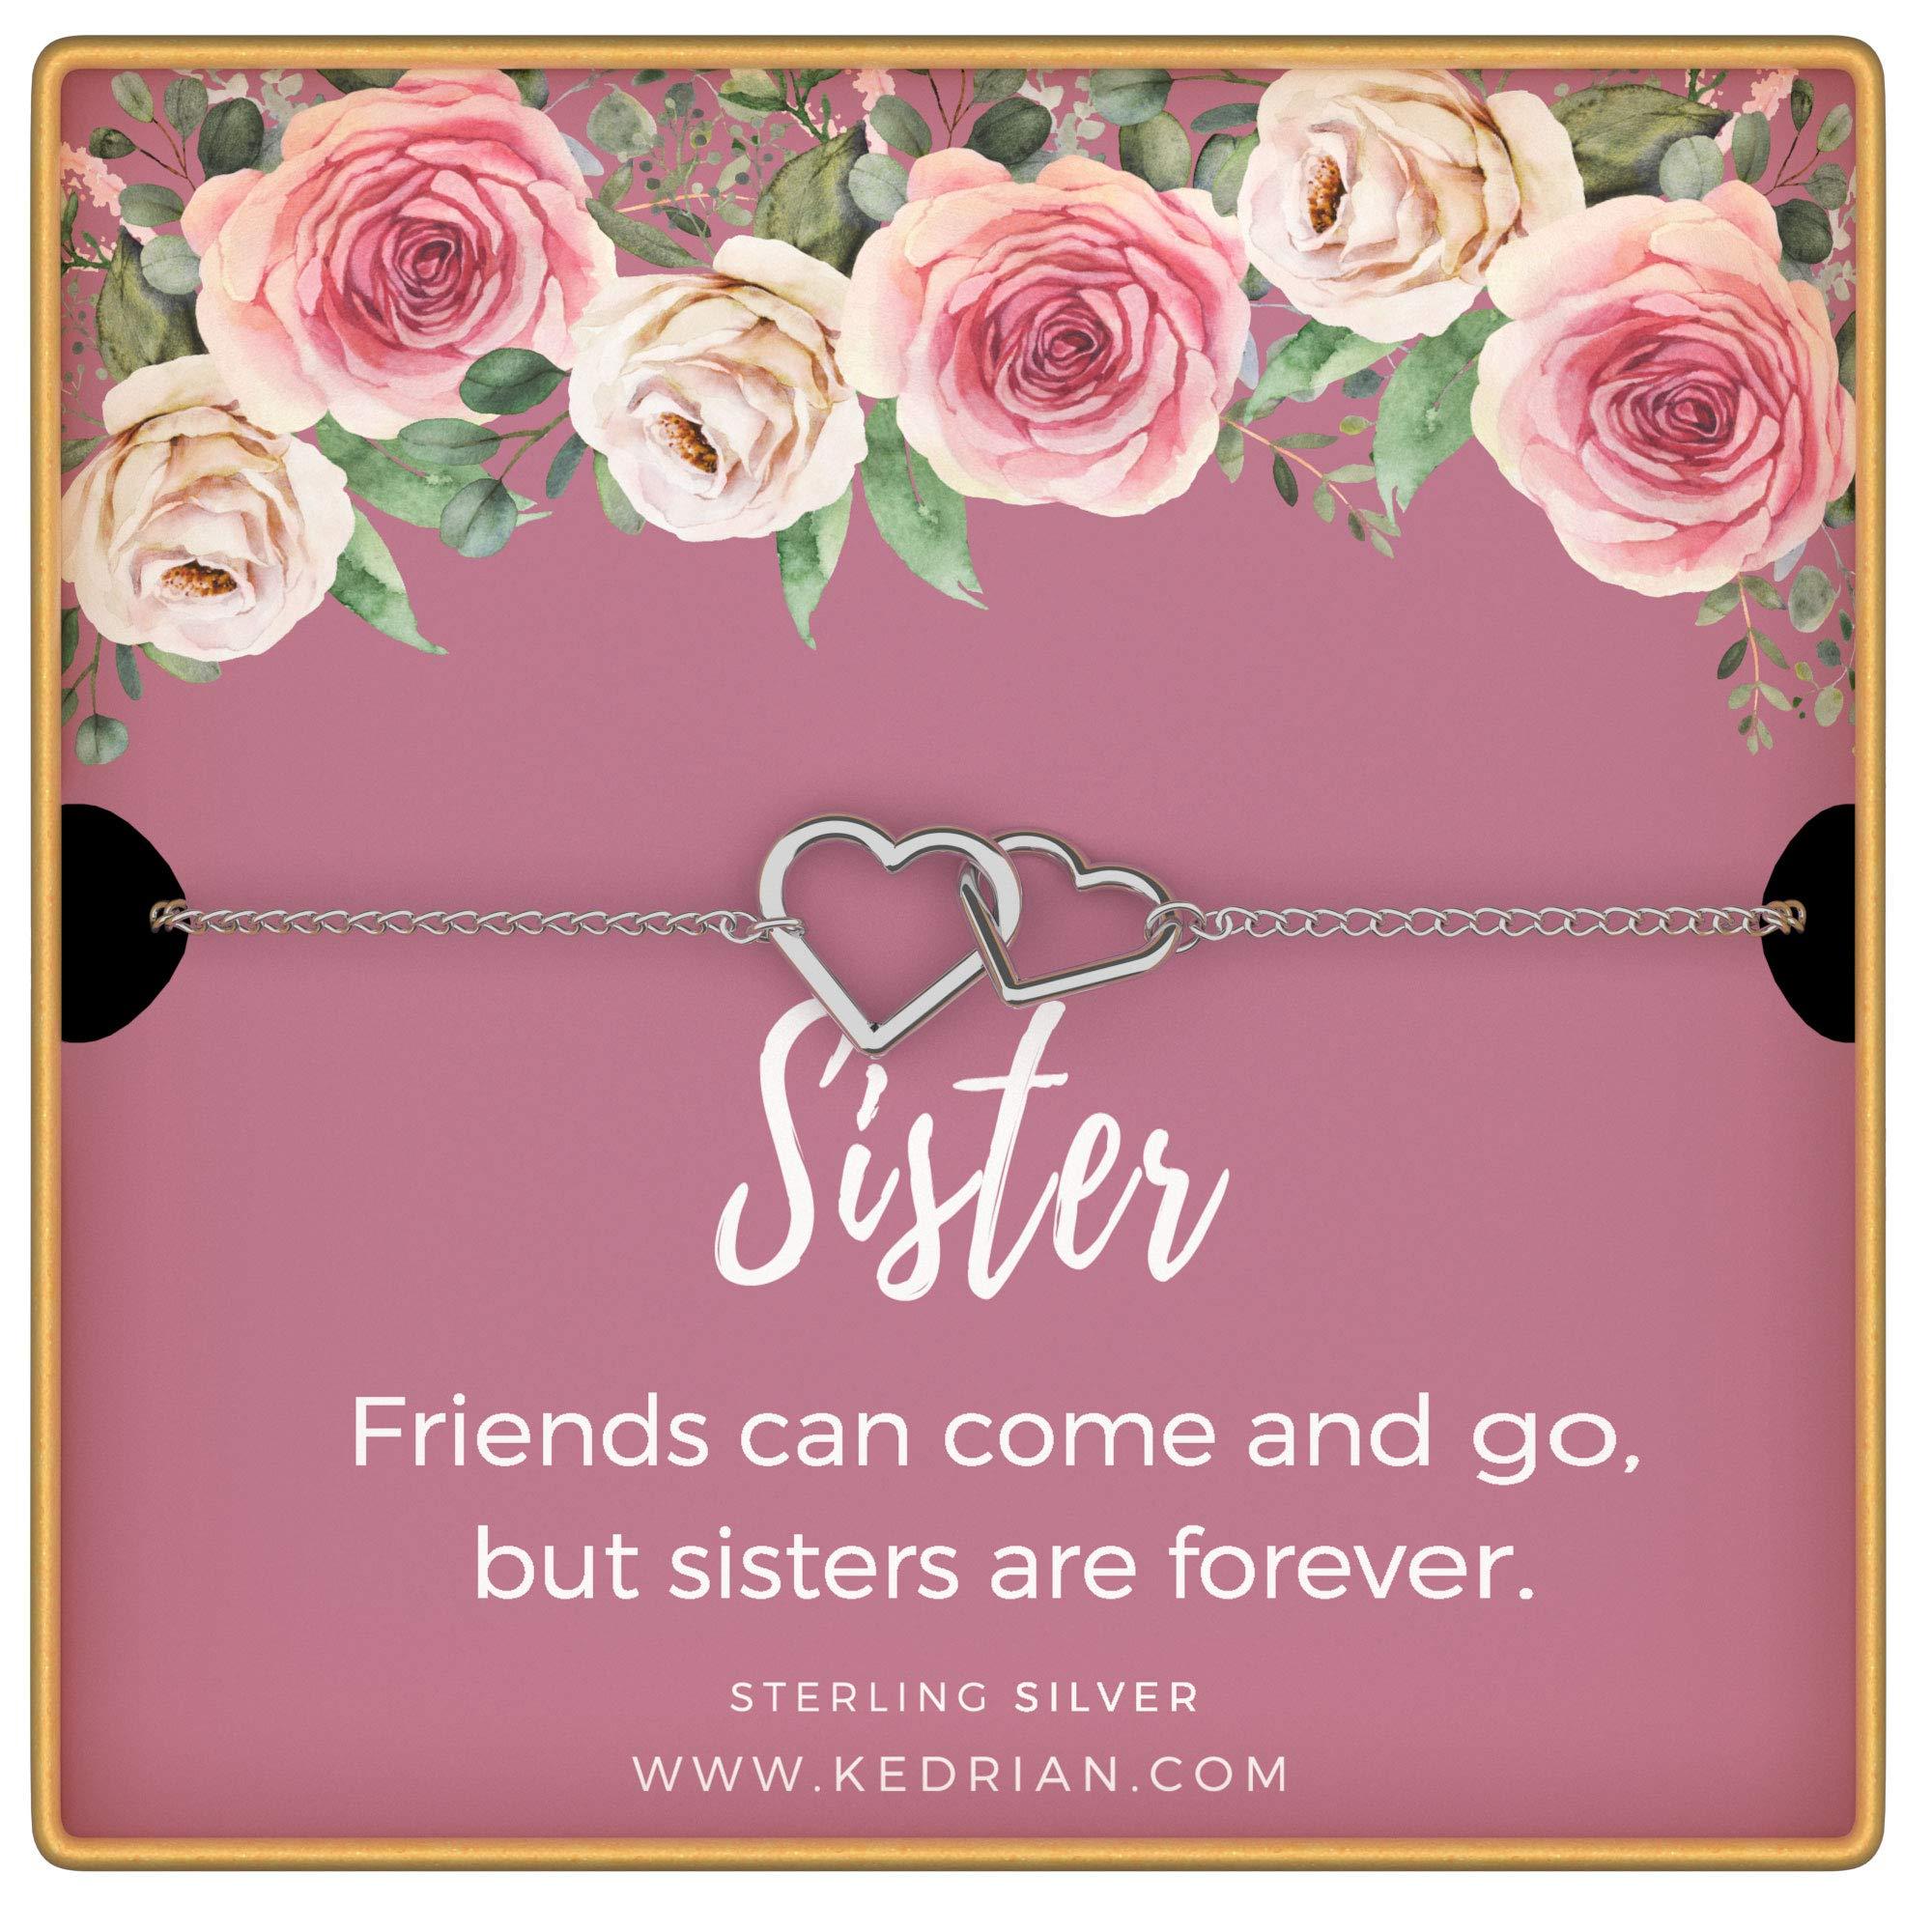 KEDRIAN Sister Bracelet, 925 Sterling Silver Interlocking Hearts Bracelet, Sister Gifts From Sister, Big Sister Gifts, Birthday Gifts for Sisters, Gift For Sister, Sister Birthday Gift, Sister Jewelry